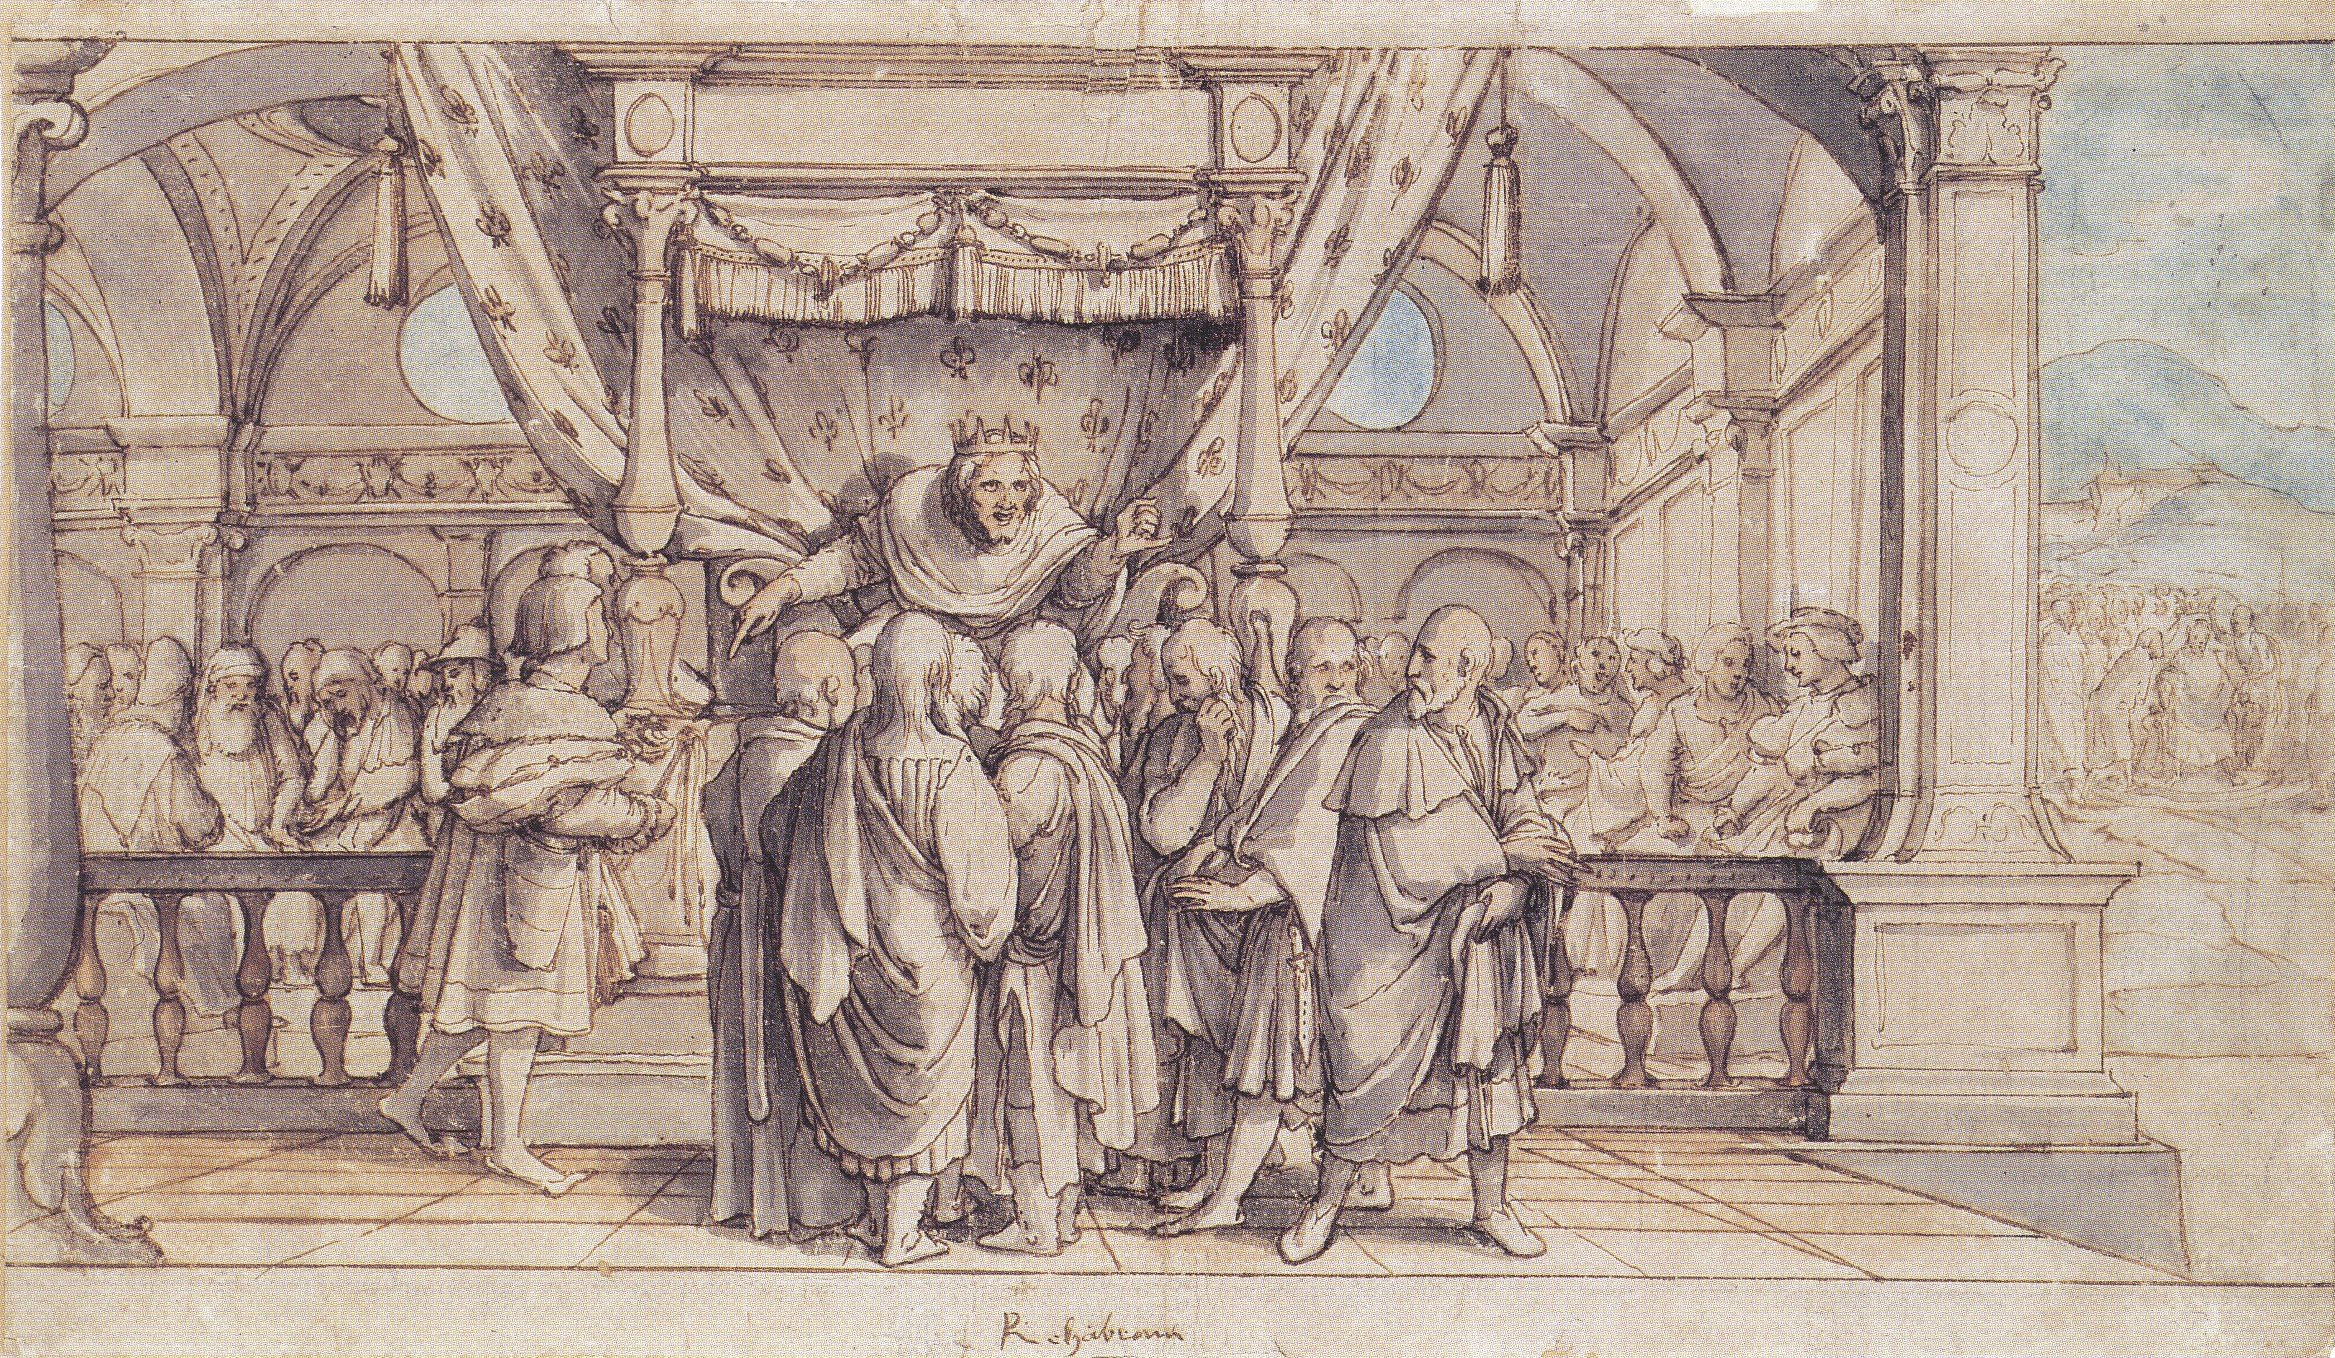 Rehoboam's Insolence. 1530